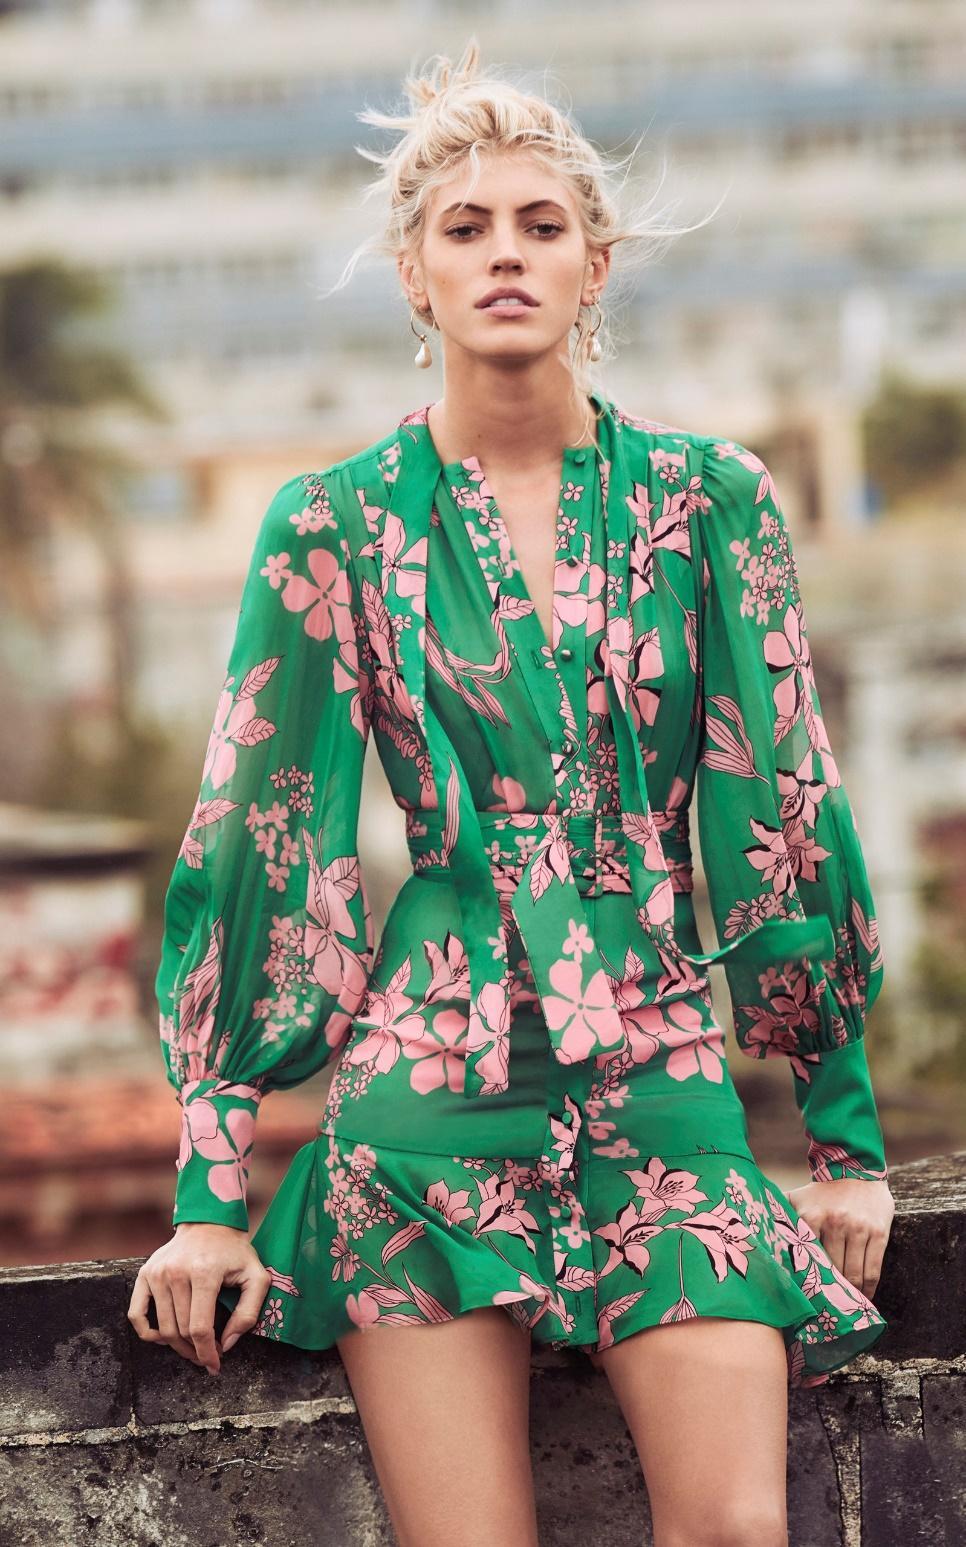 EDEN Greed Floral Print Long Sleeve Ruffle Mini Dress – Wecapricious